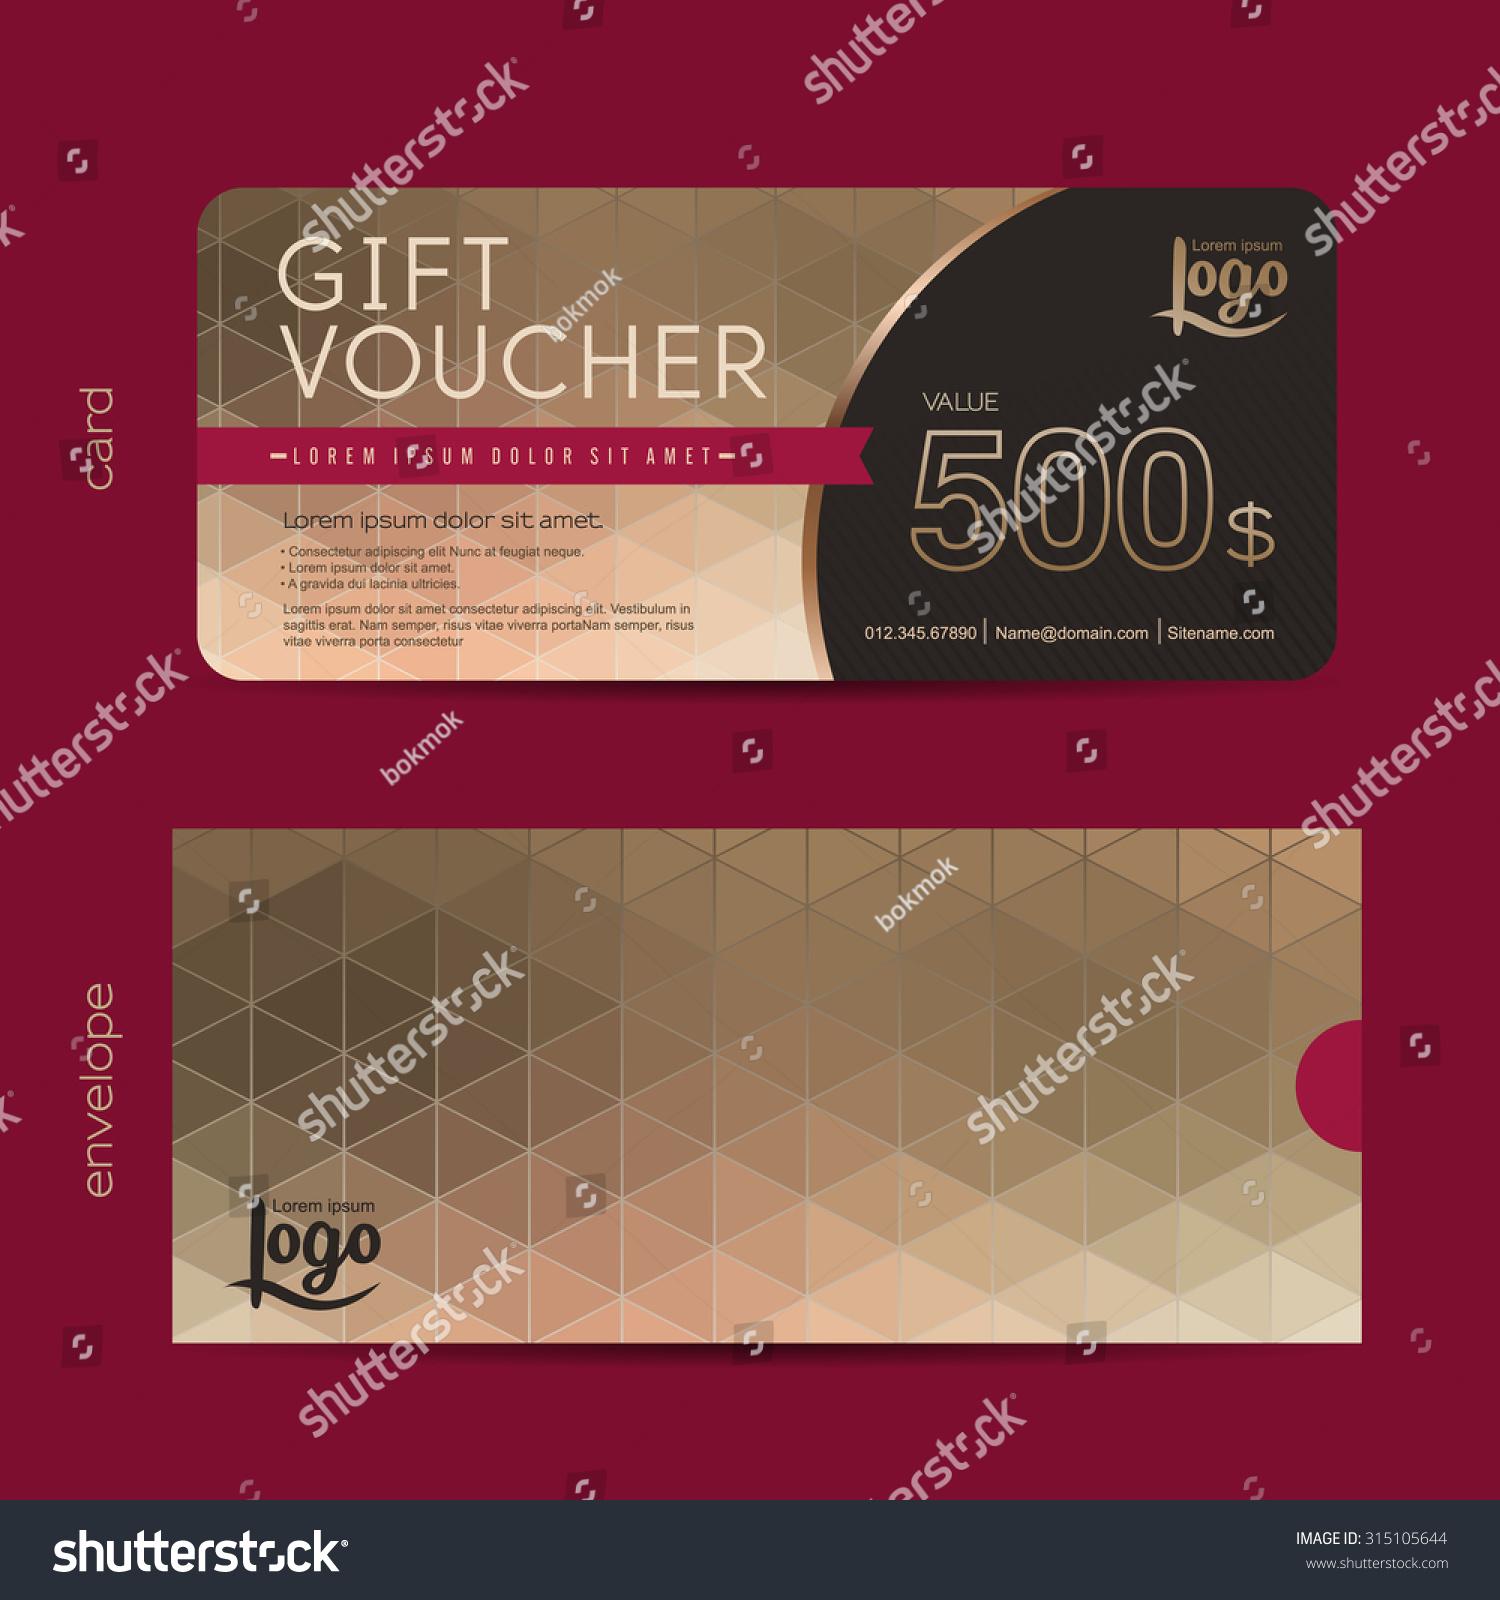 gift voucher template premium patterngift voucher stock vector 315105644 shutterstock. Black Bedroom Furniture Sets. Home Design Ideas